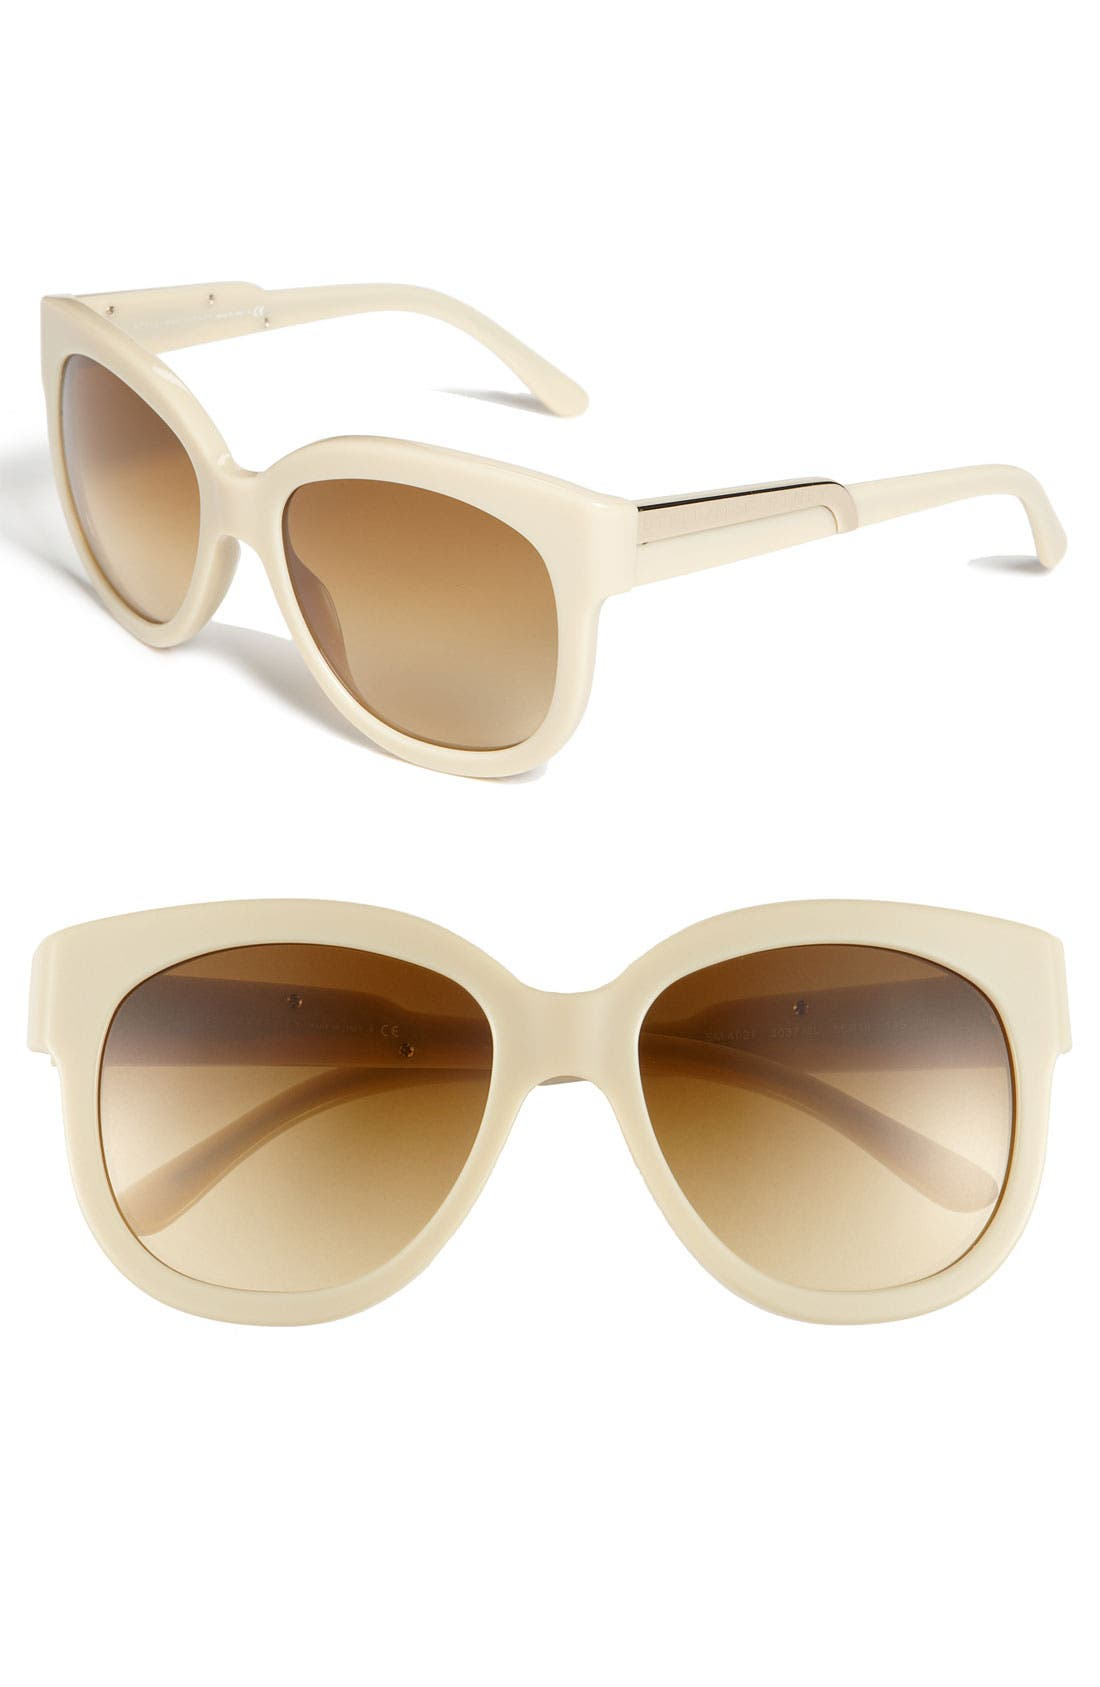 Main Image - Stella McCartney 55mm Oversized Cat's-Eye Sunglasses